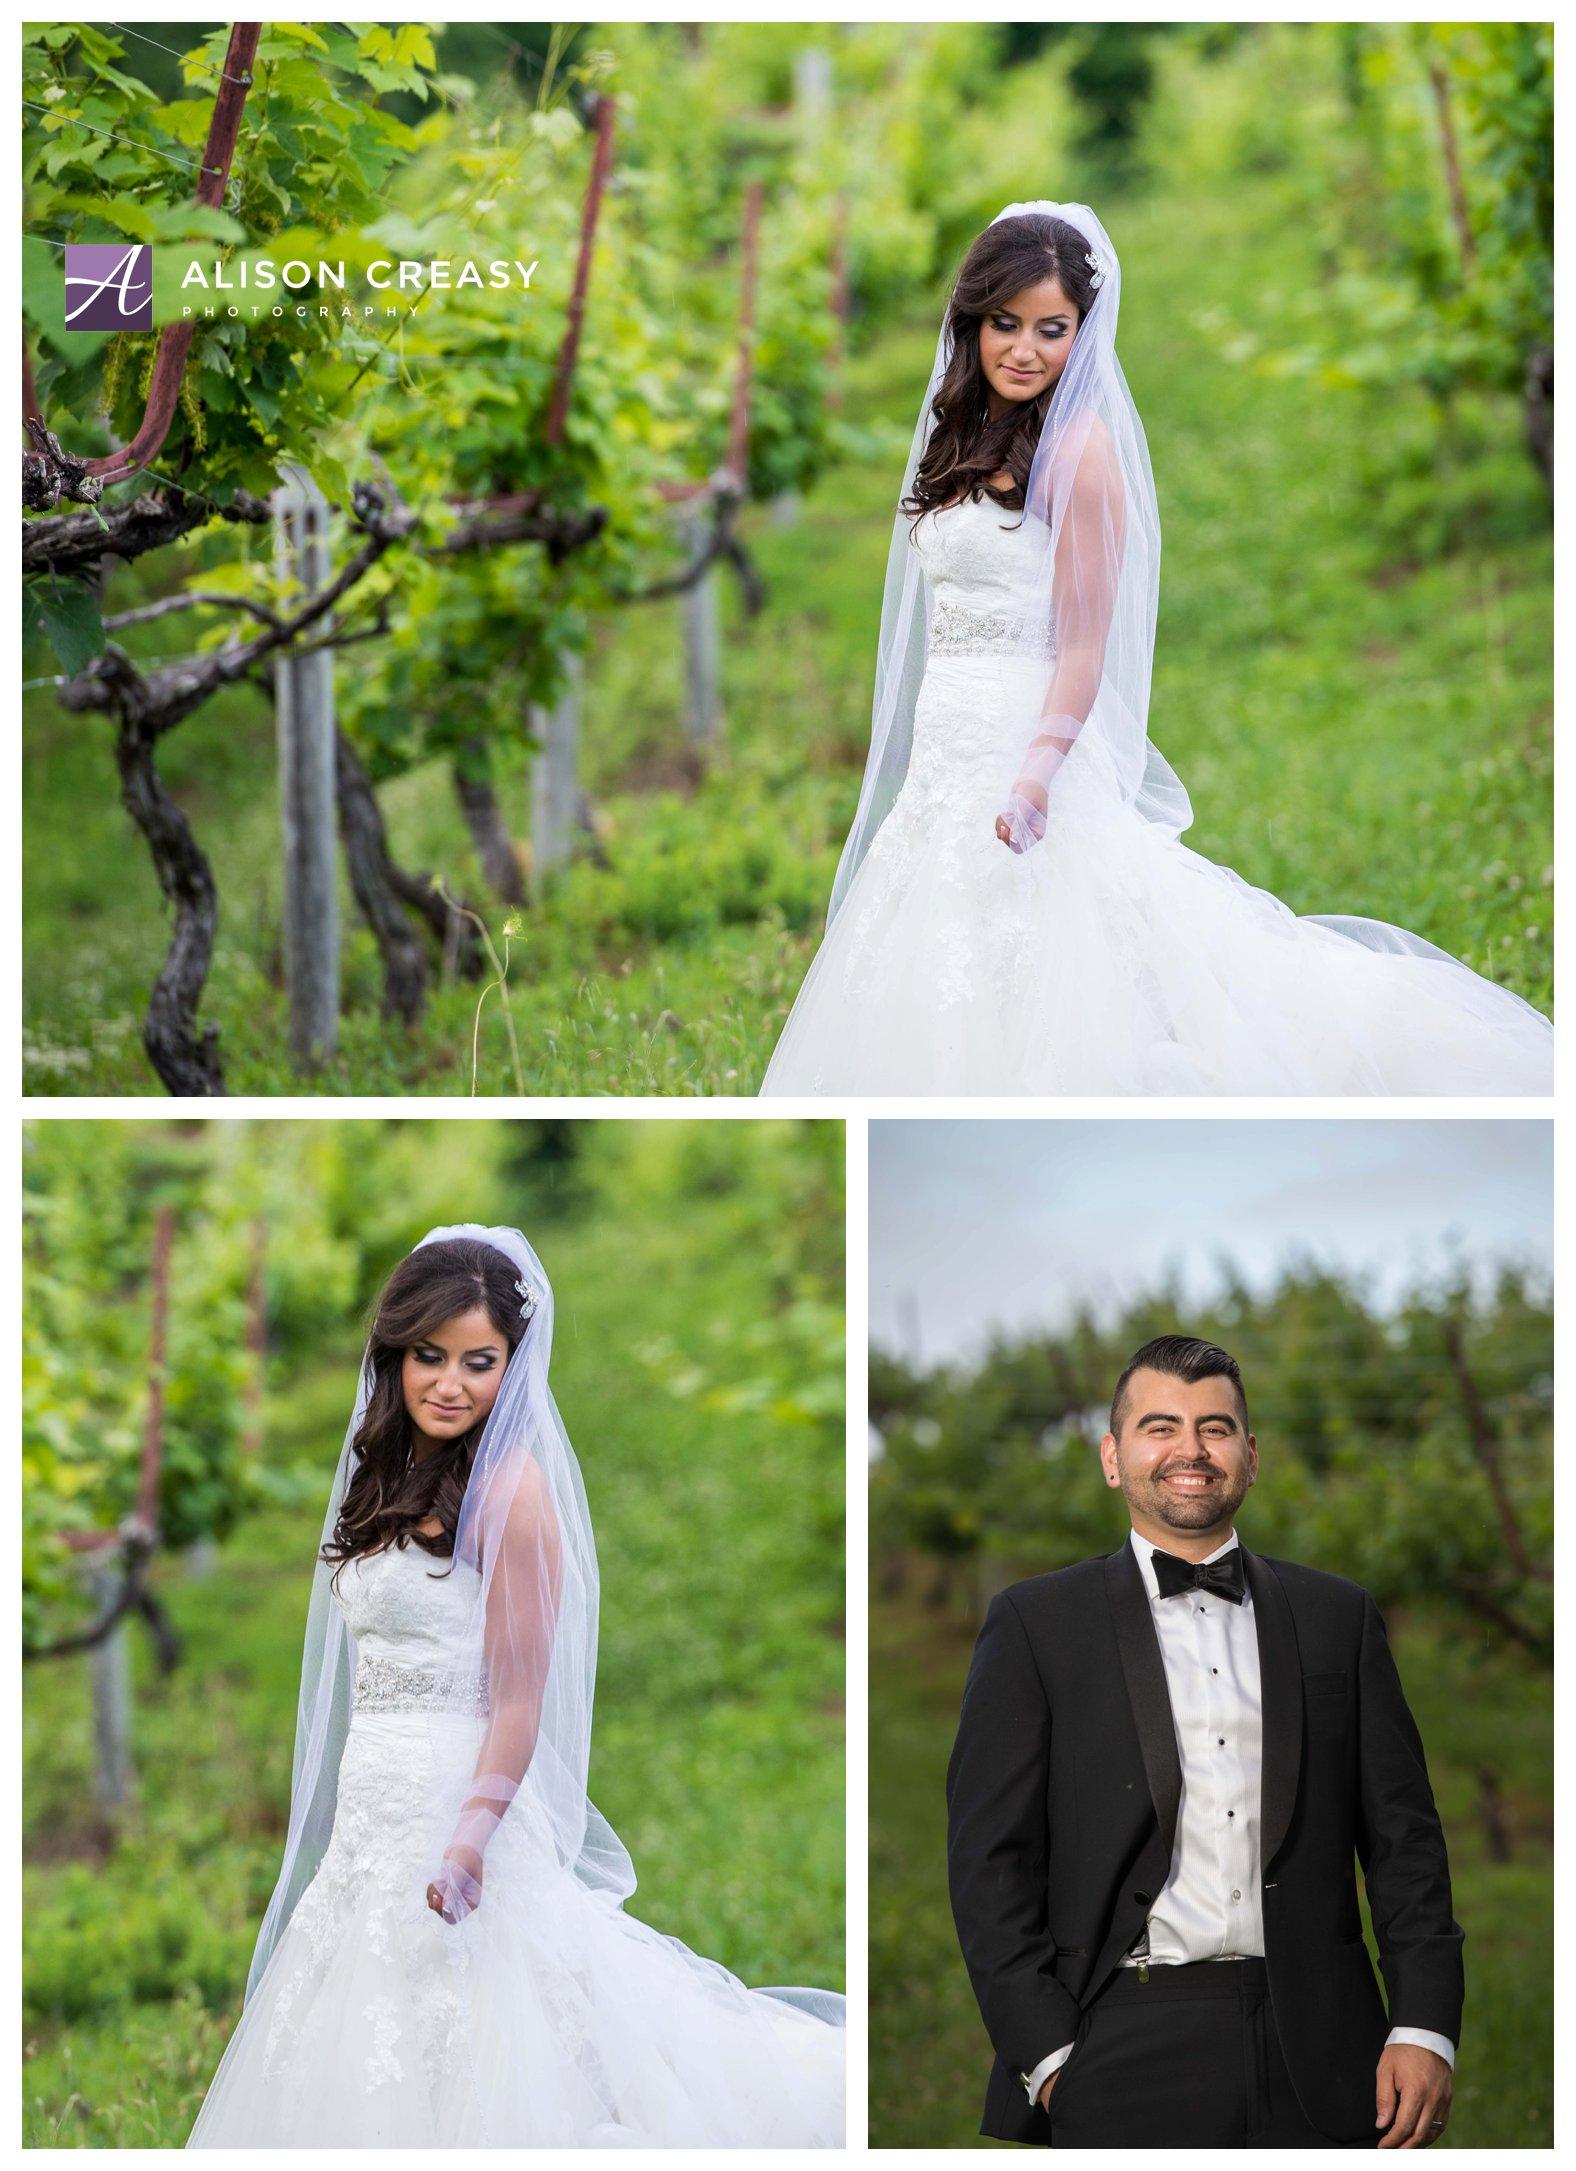 Marisol&Sergio_0028.jpg